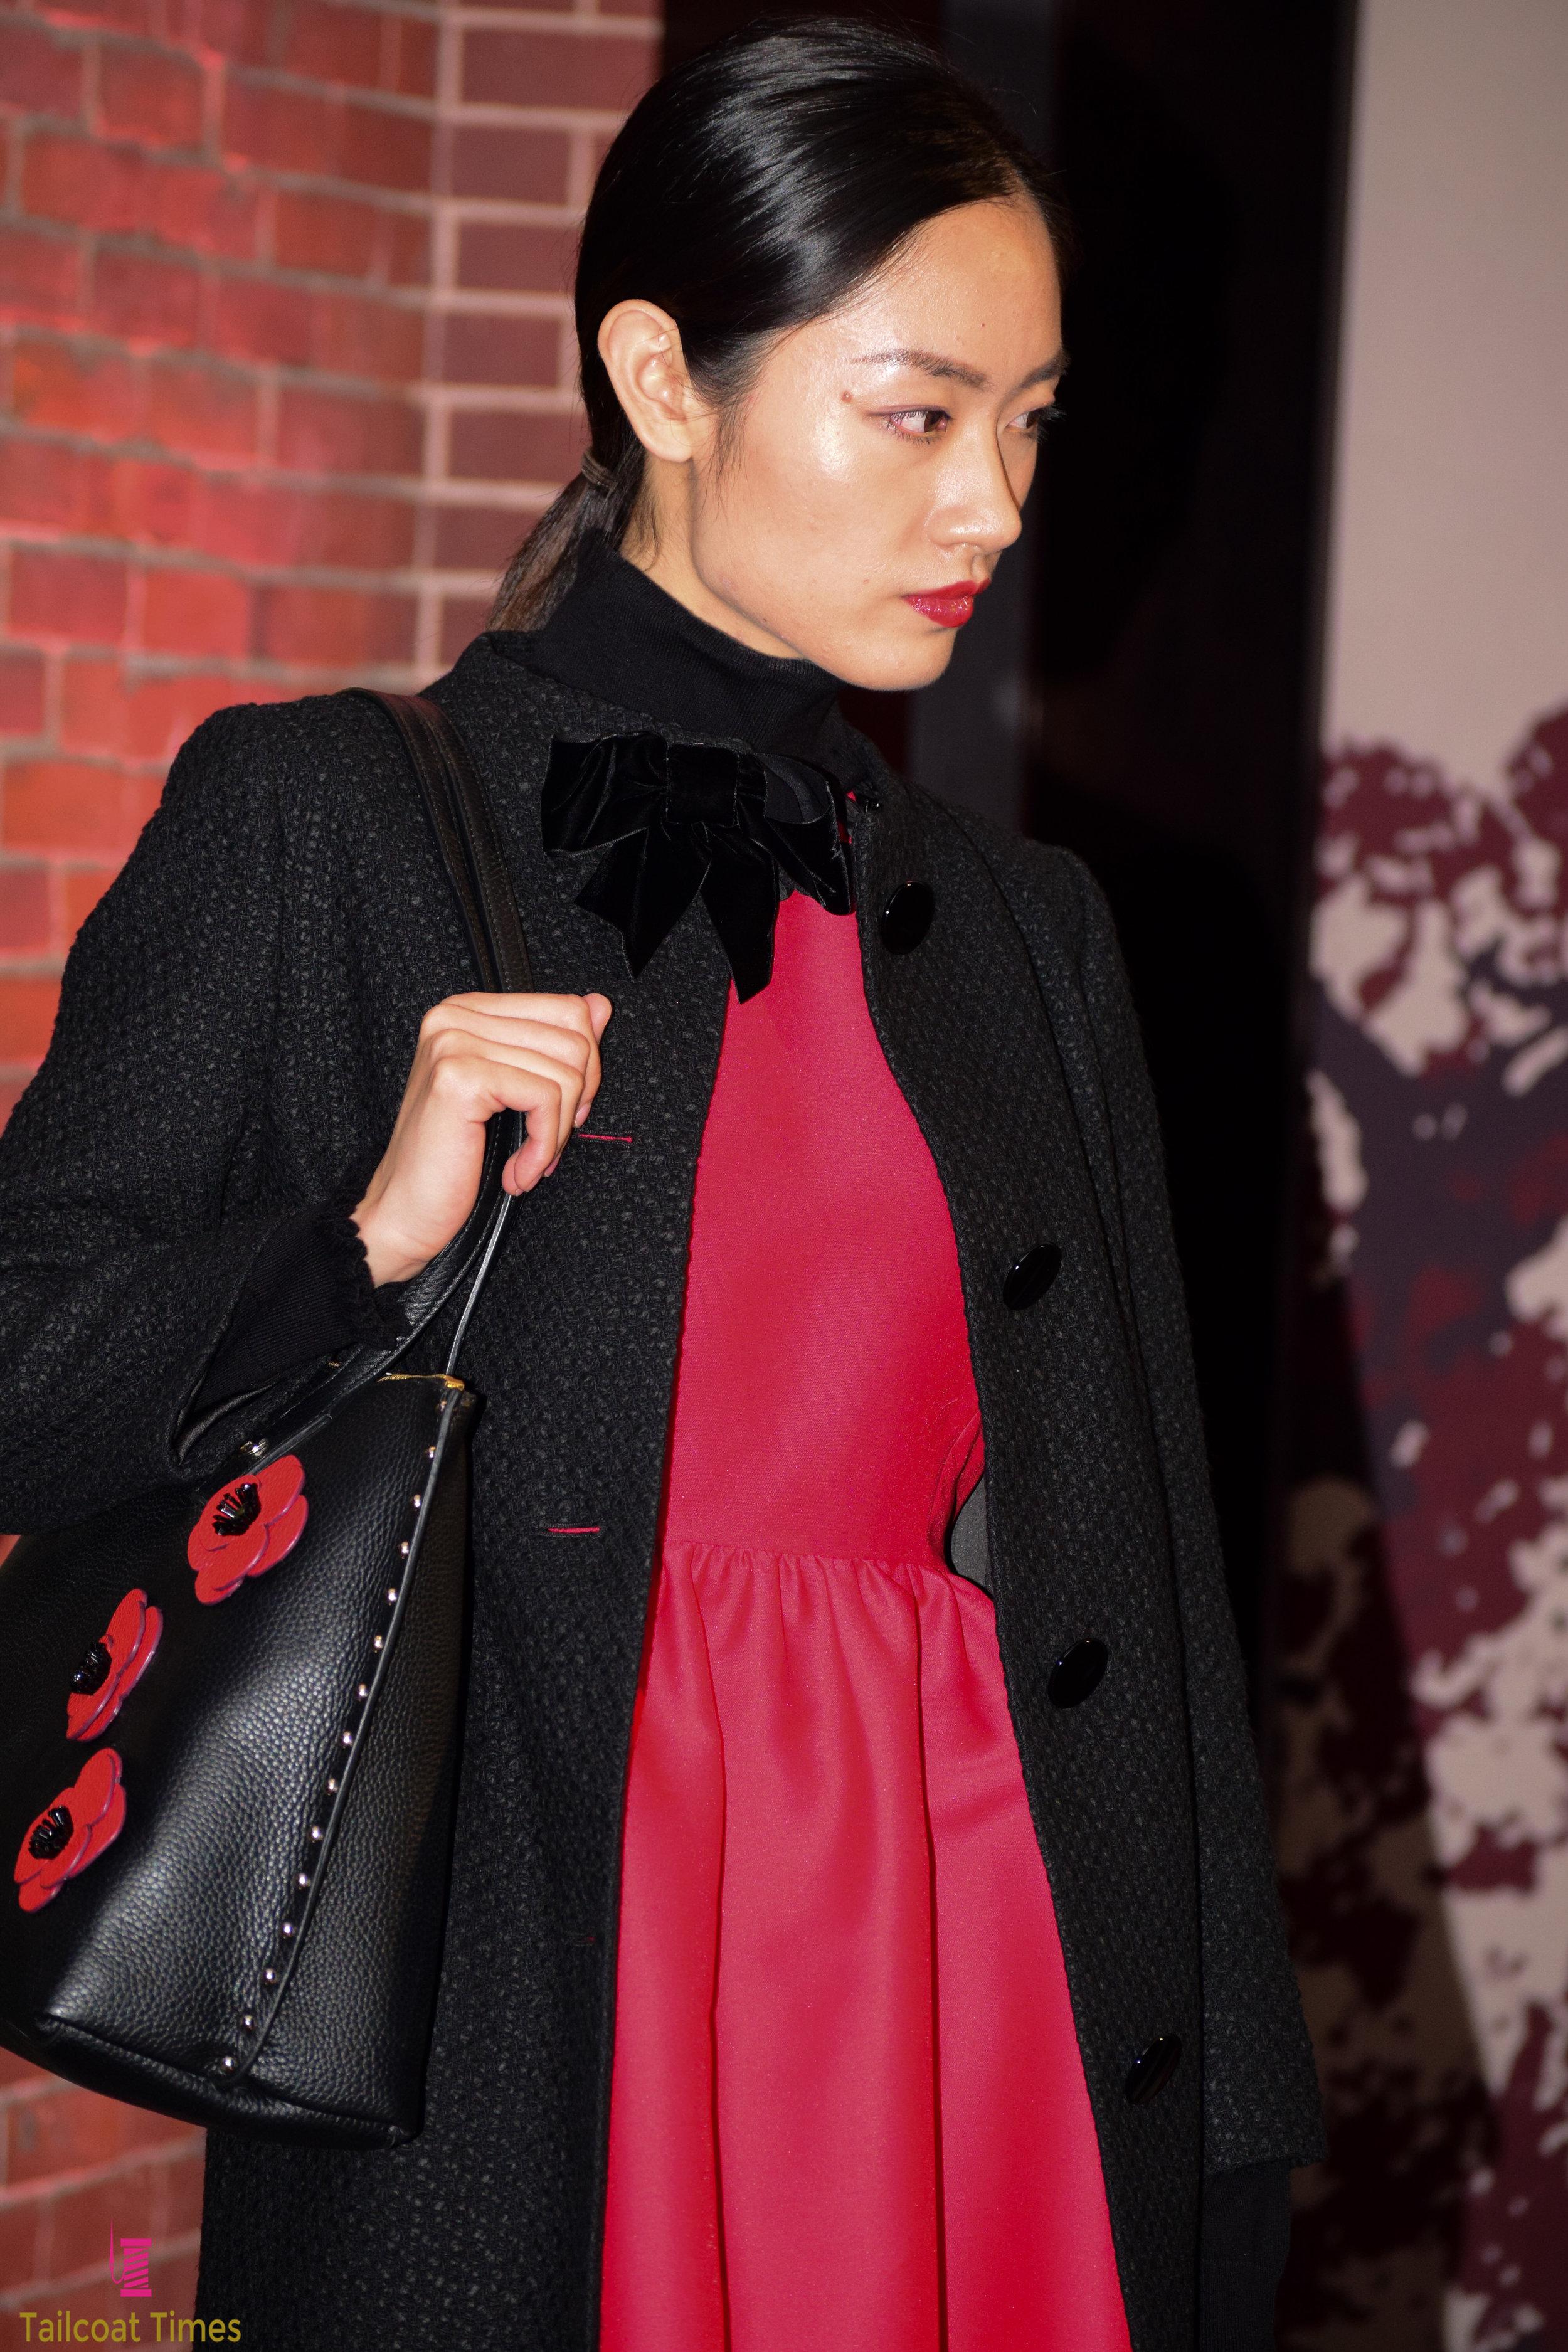 FashionablyLate_Kate Spade_Tailcoat Times (5 of 23).jpg